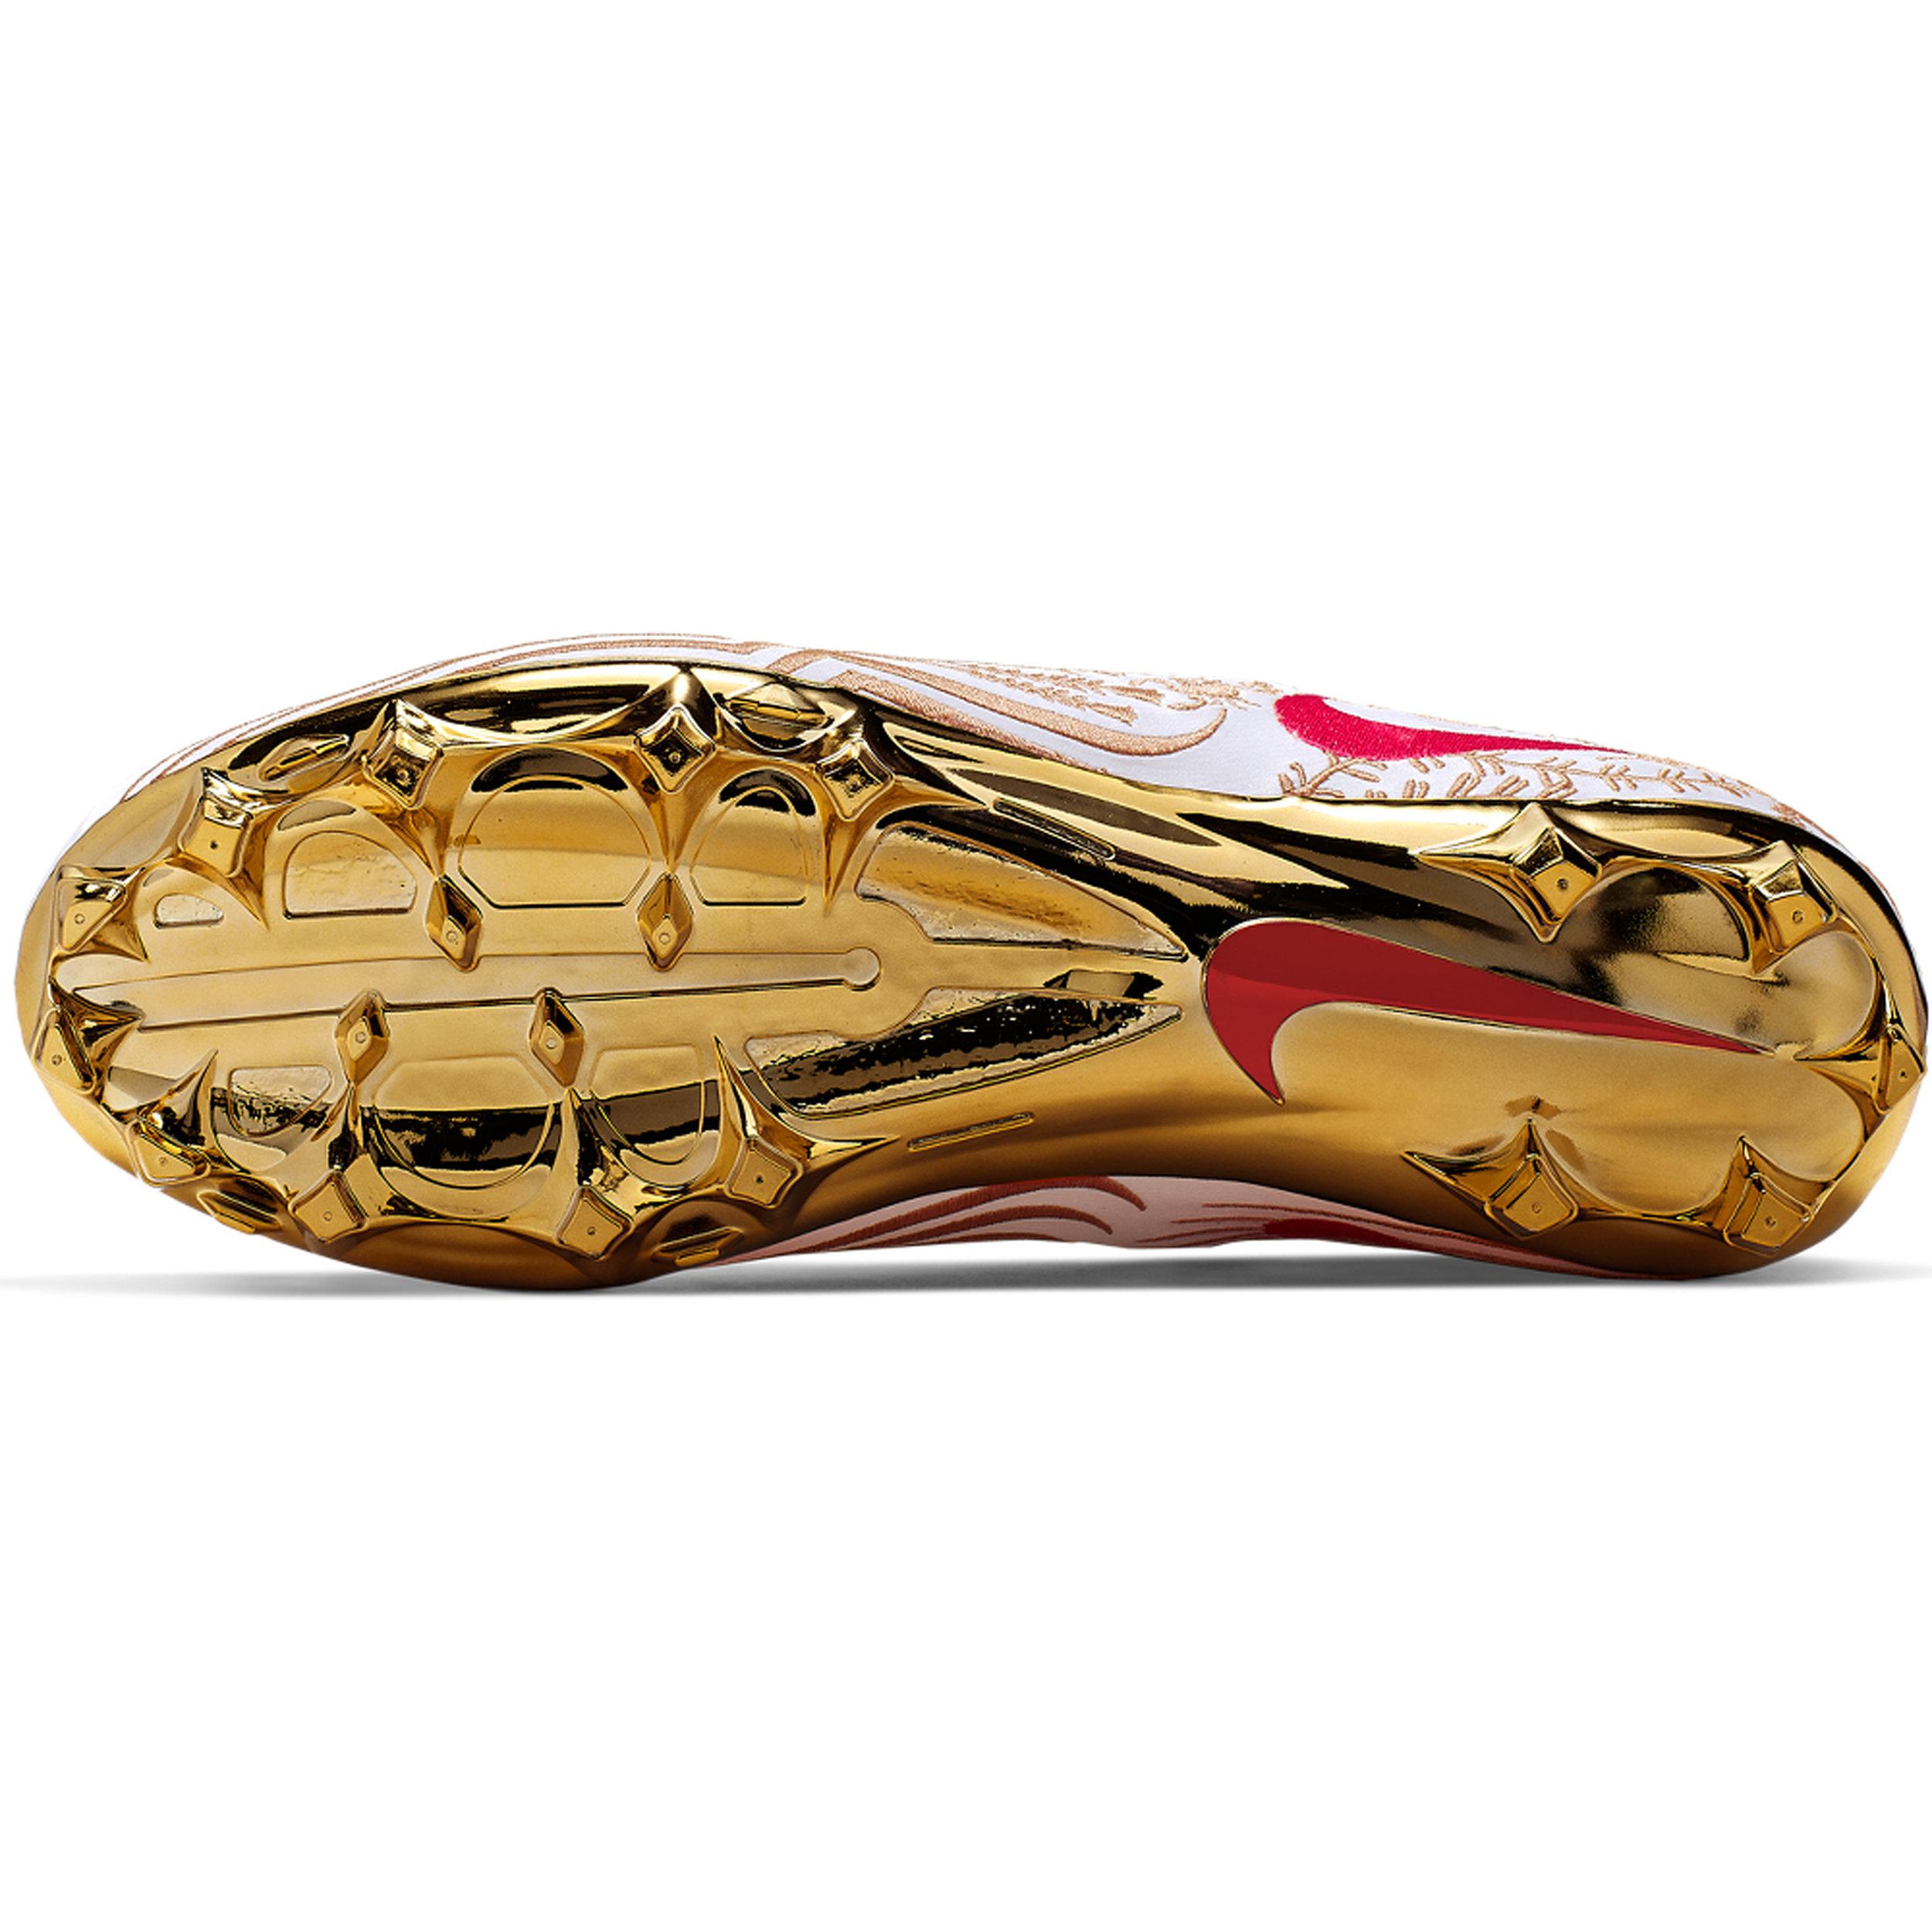 NikeNews_NikeVaporUntouchablePro3_OBJ_08_89283.jpg